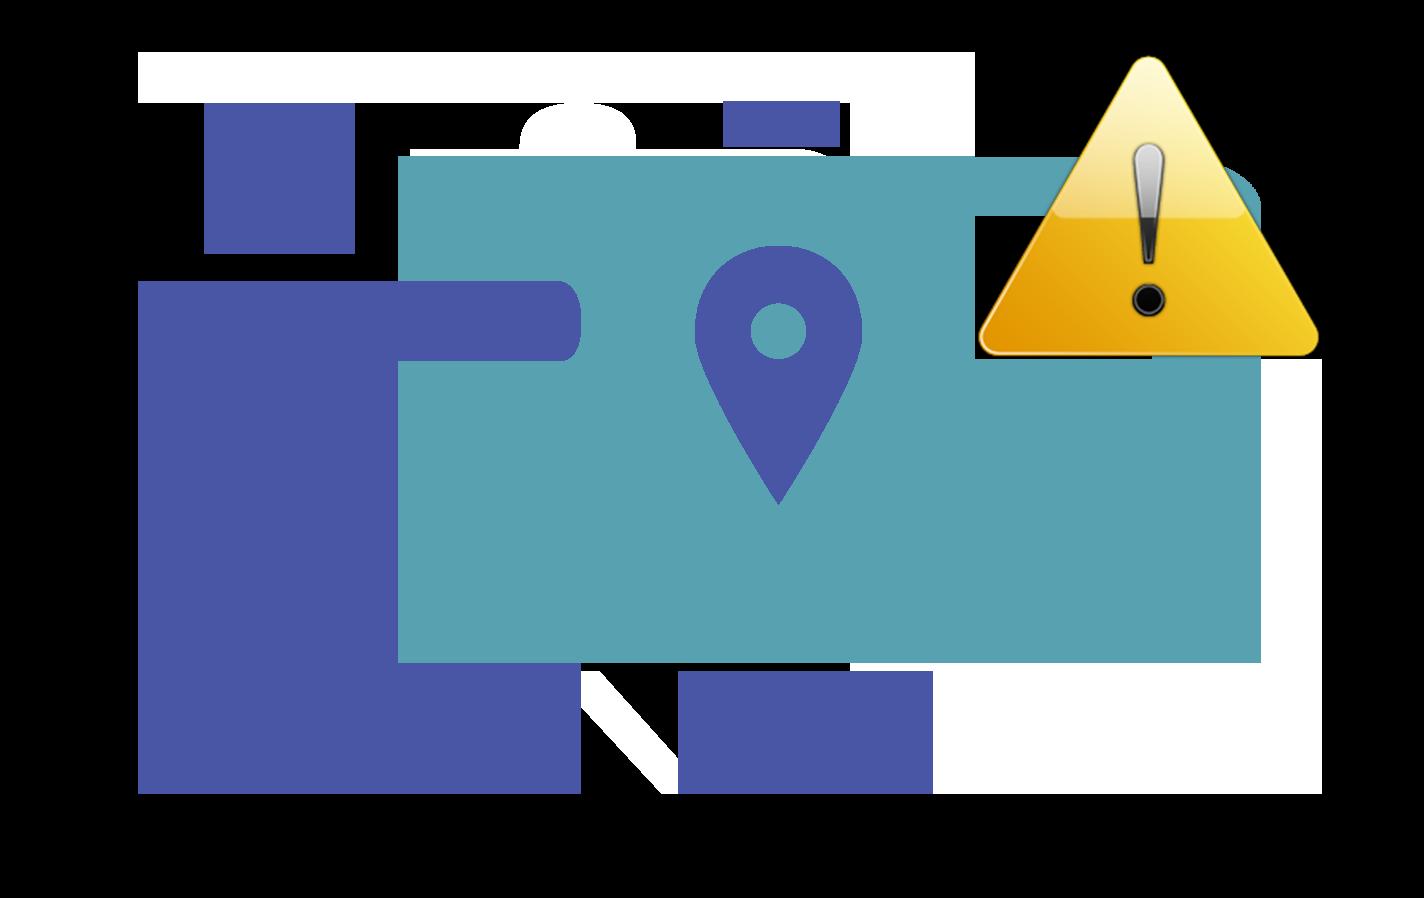 workshop venue change icon